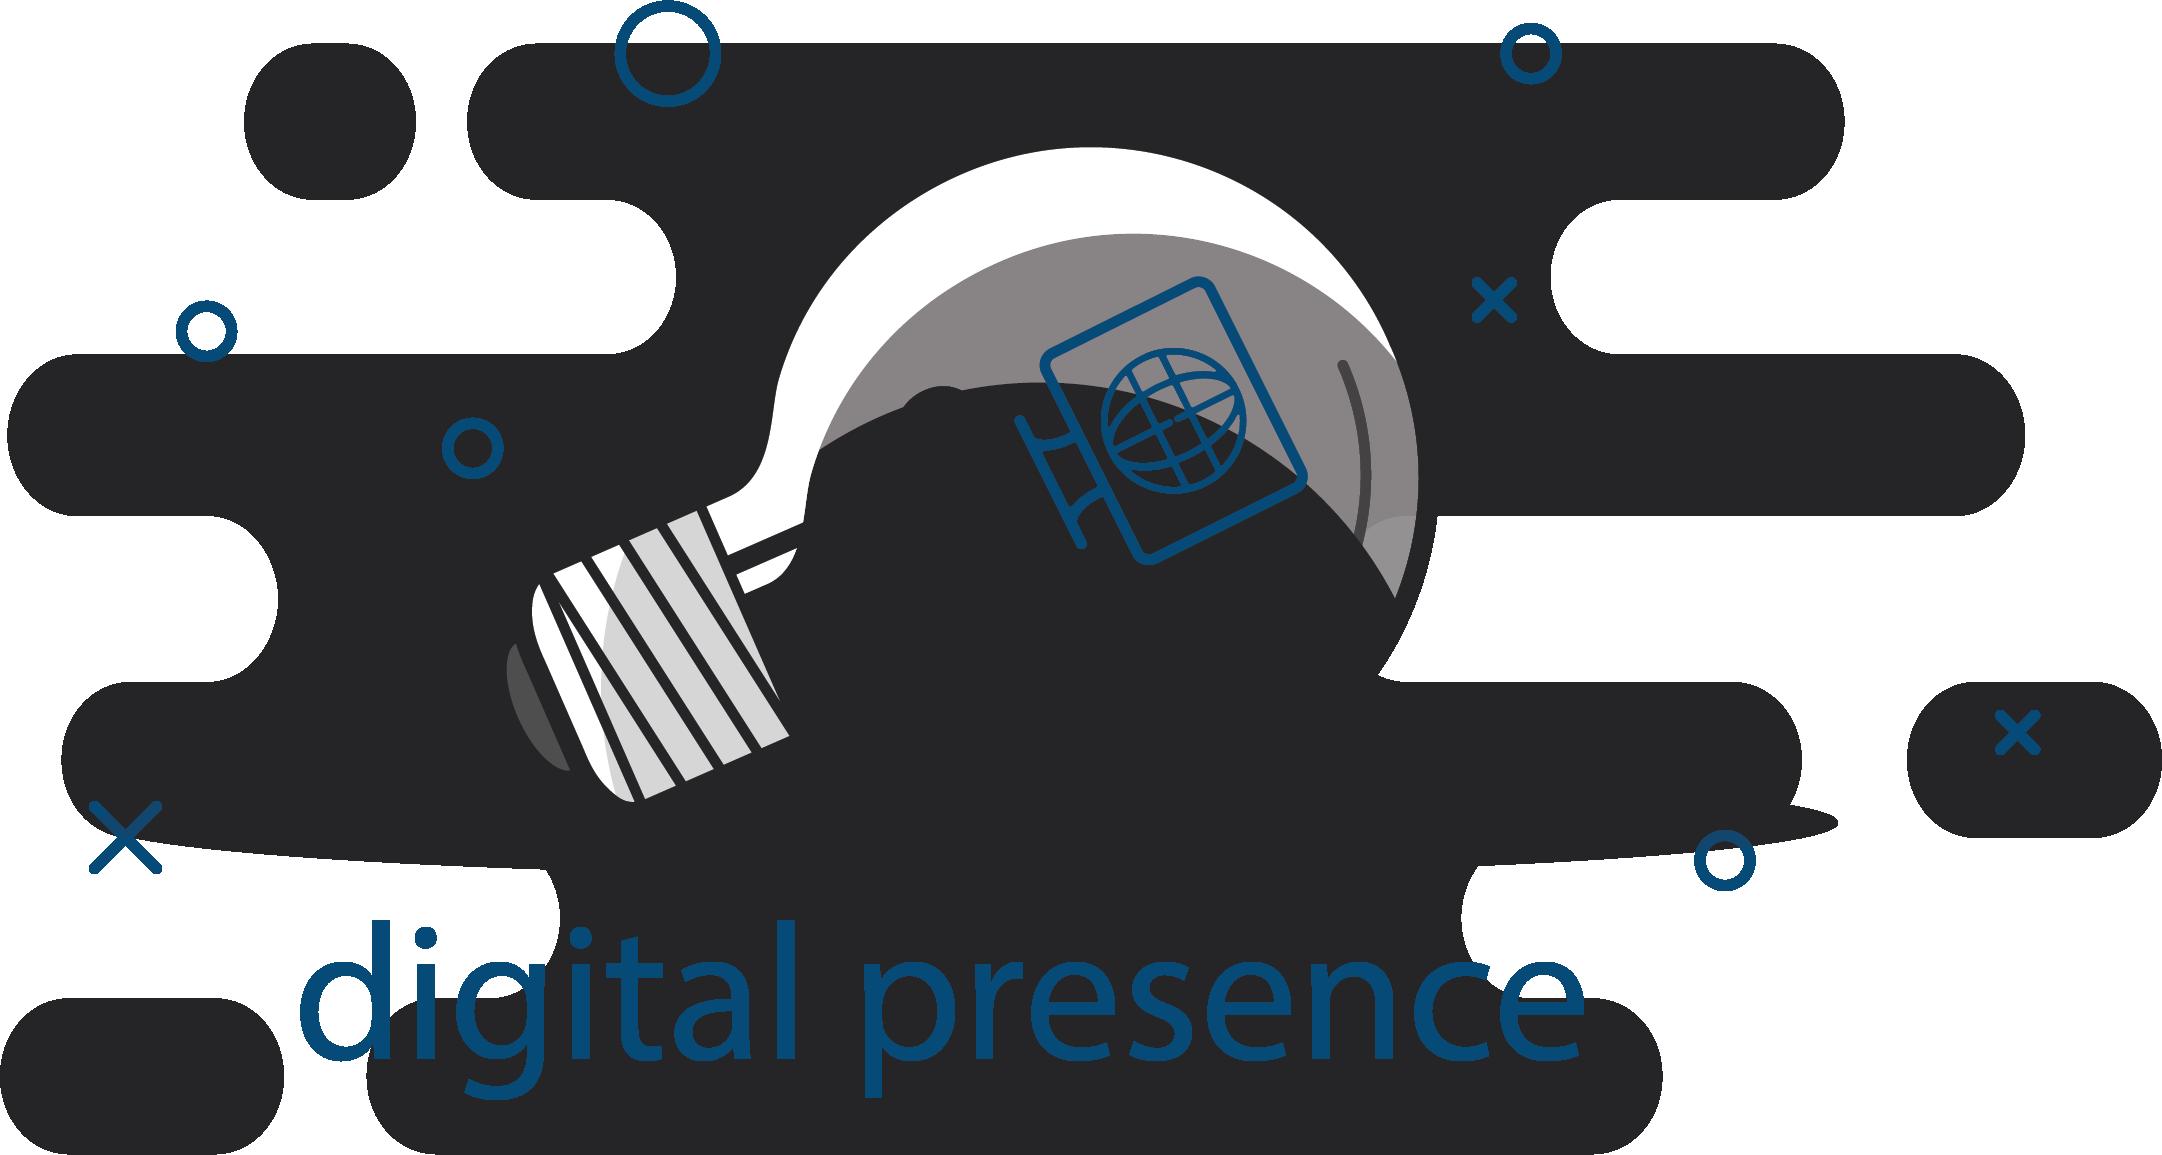 Digital Presence lightbulb